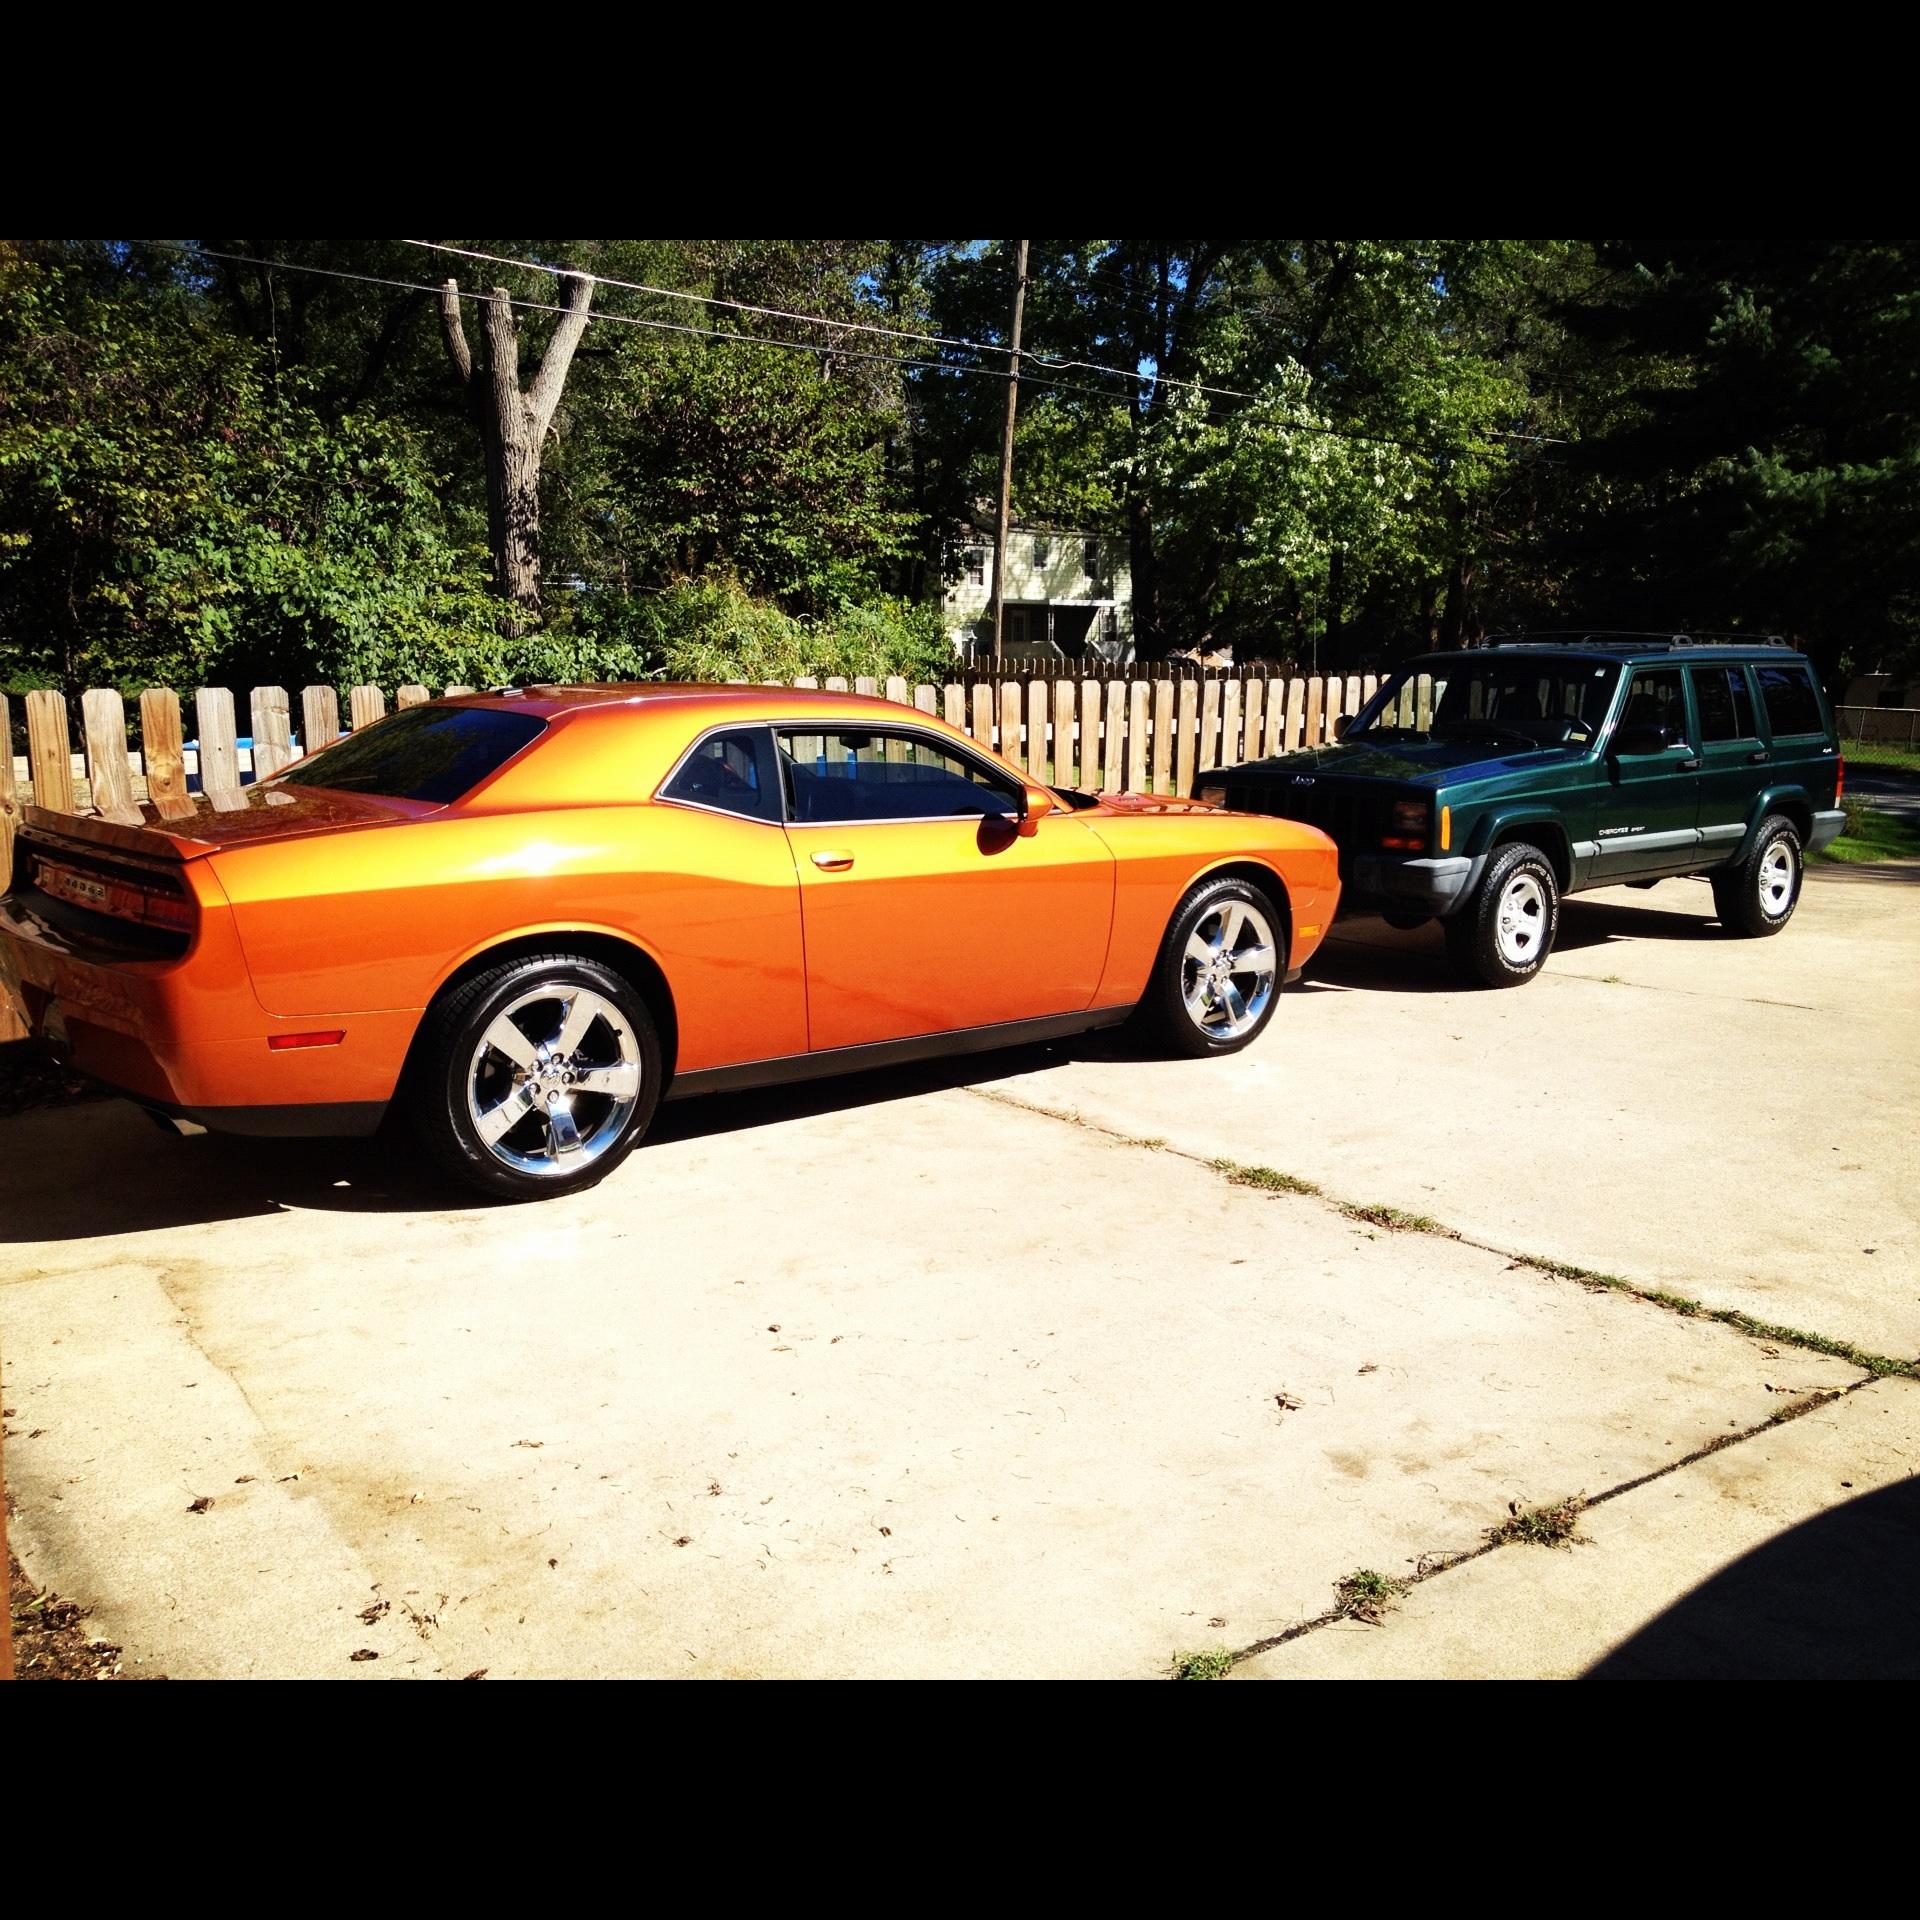 Hemi and Header Orange Challengers-image.jpg